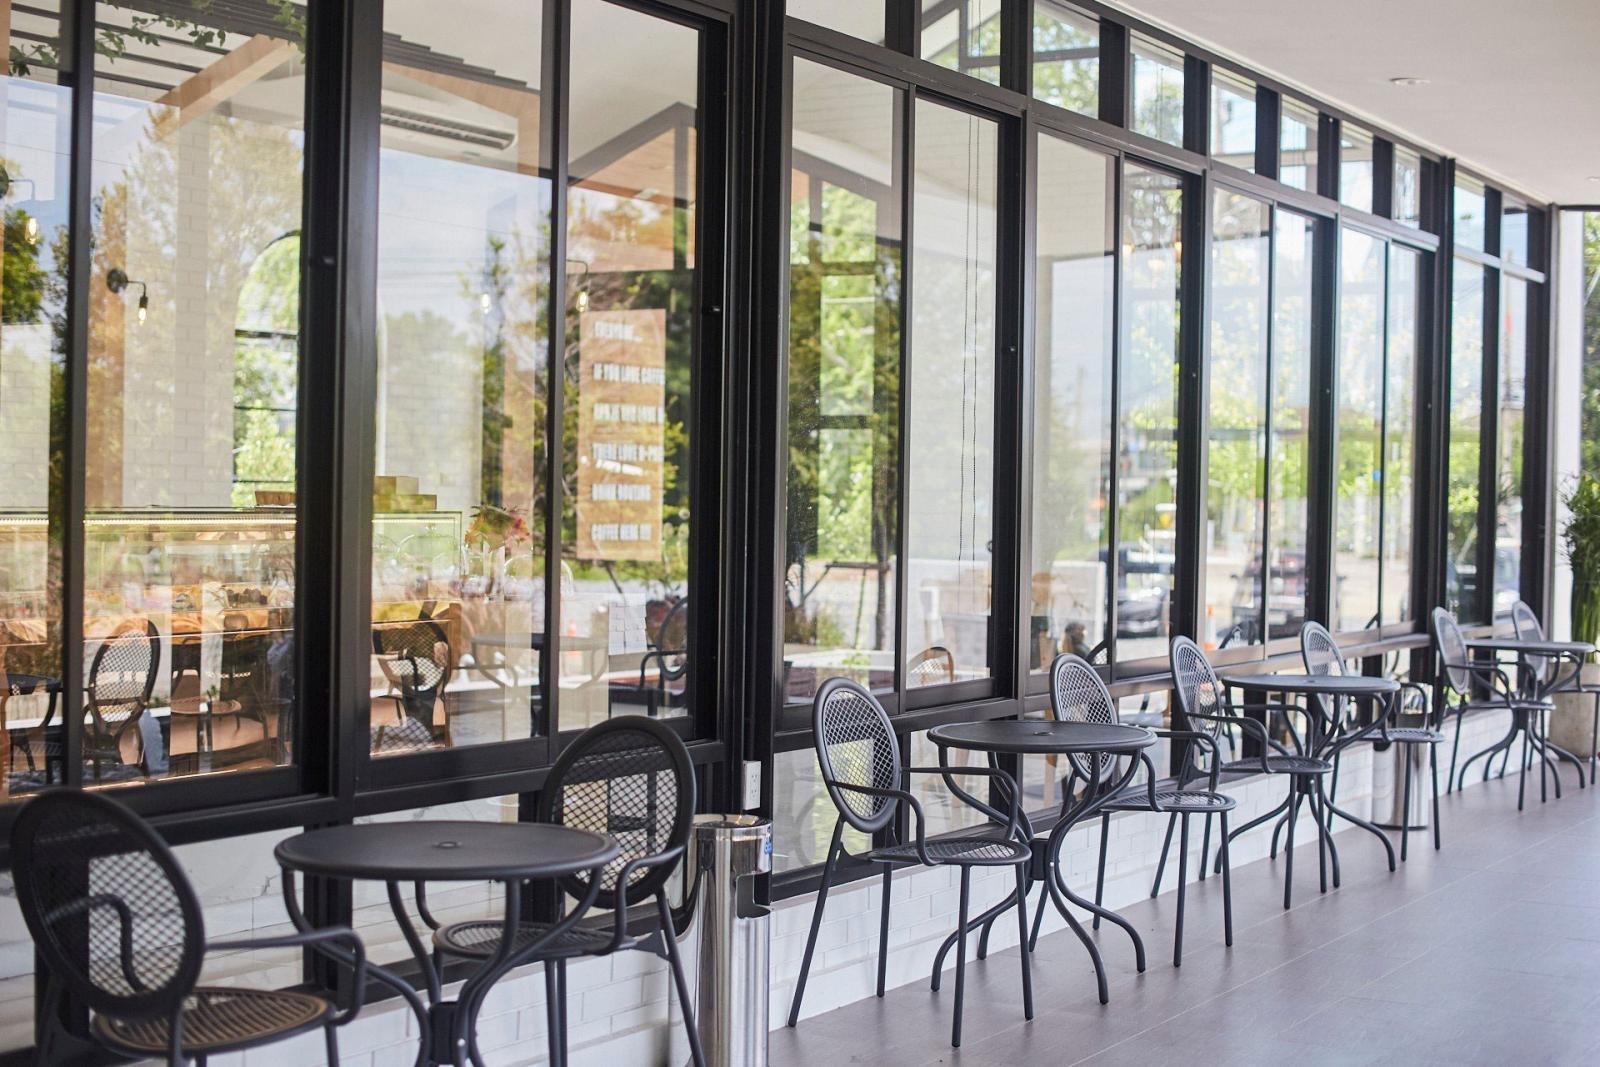 D'Presso Cafe & Restaurant คาเฟ่สายชิลครบทั้งคาวหวาน